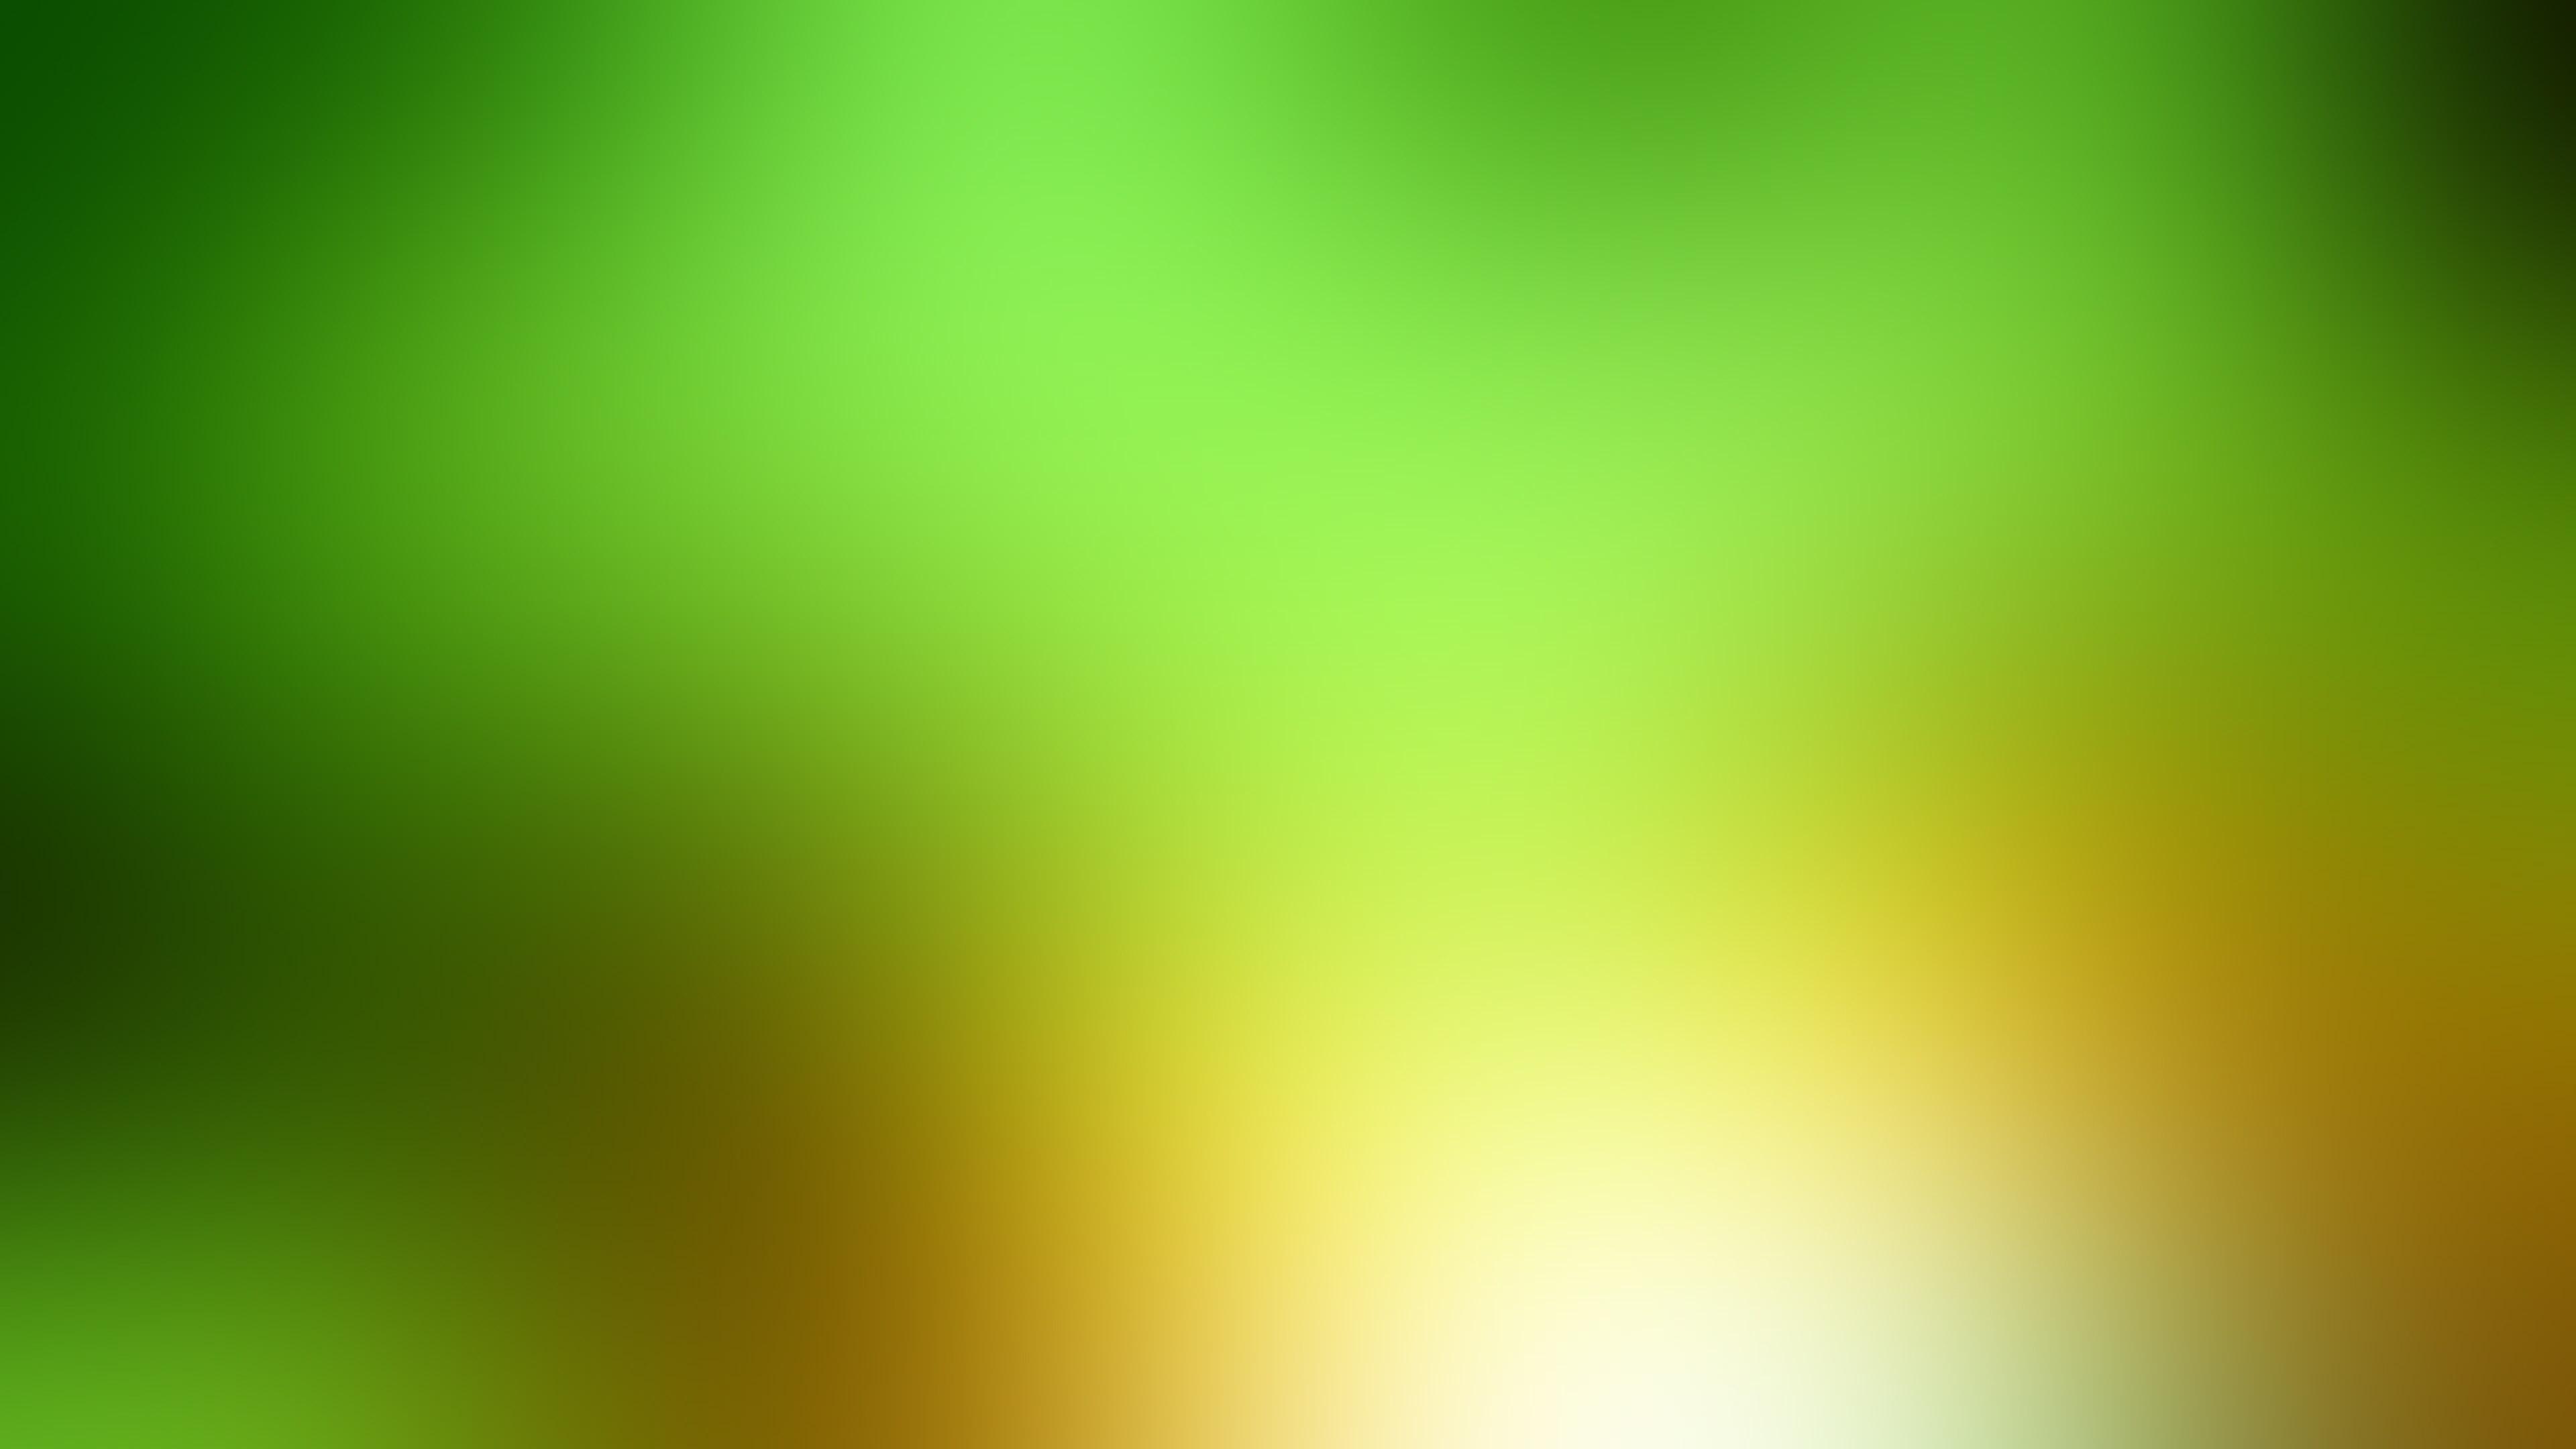 Green And Yellow Wallpaper Wallpapersafari